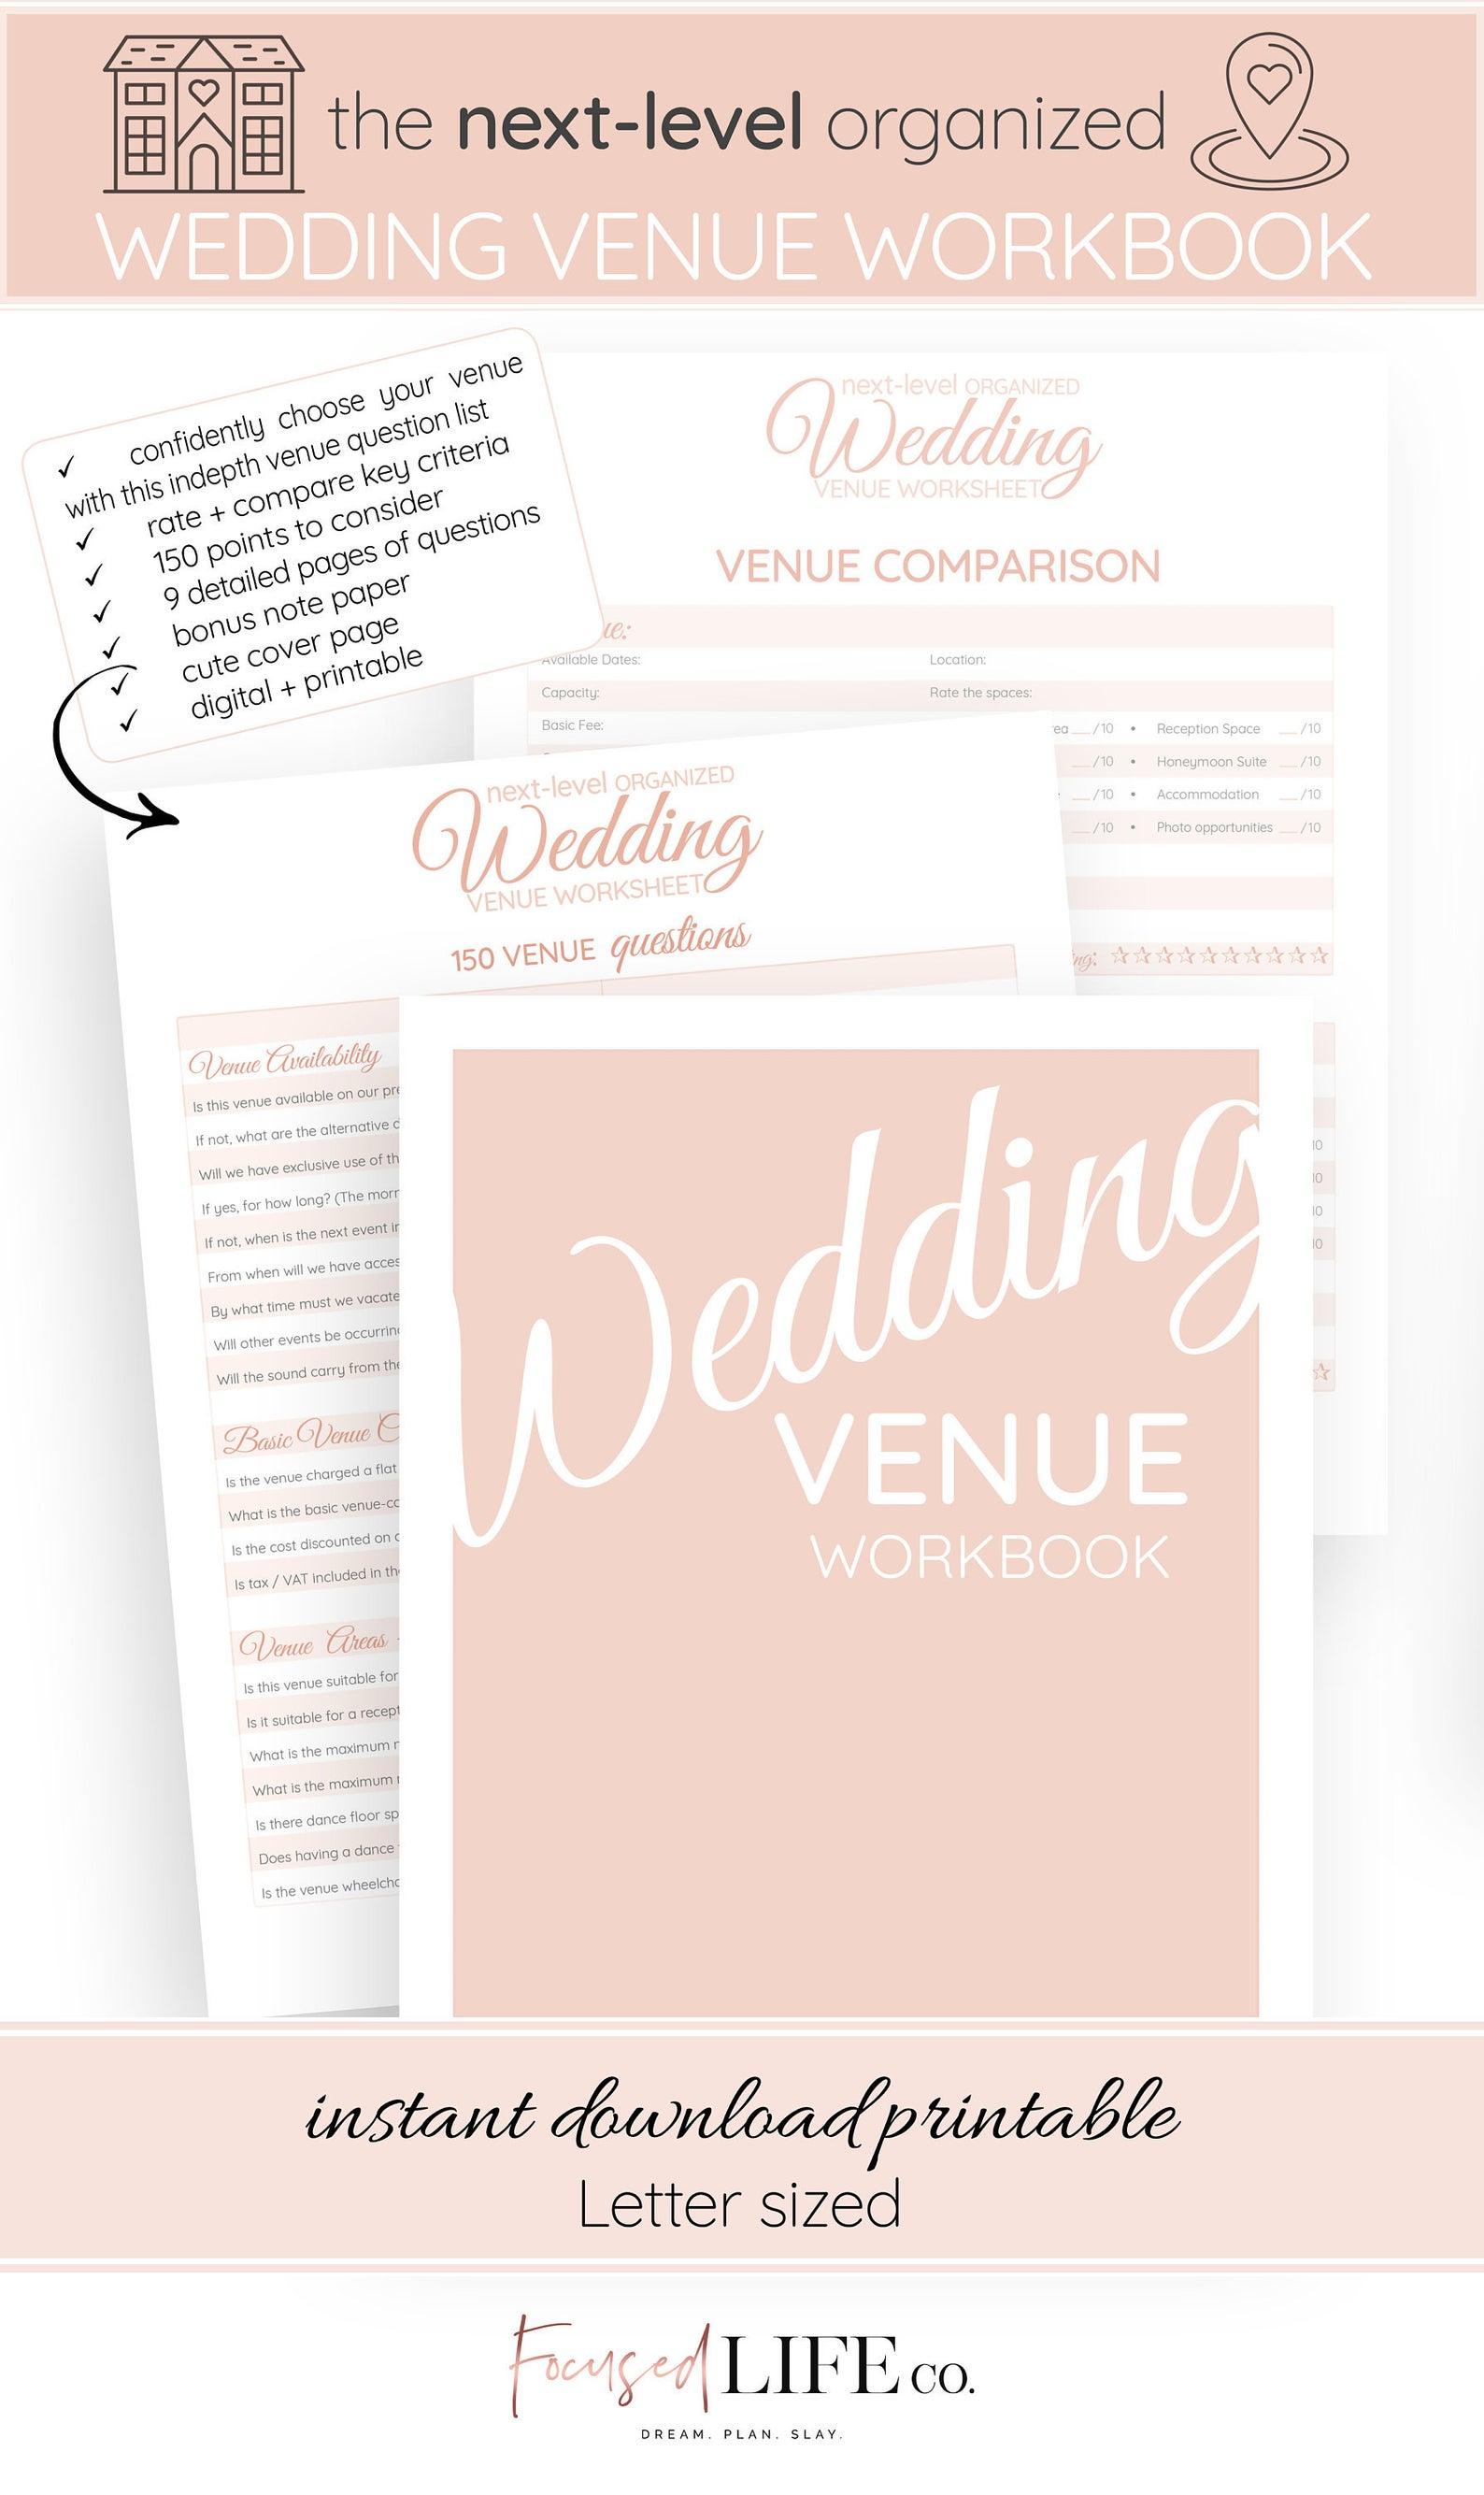 Wedding Venue Questions Workbook